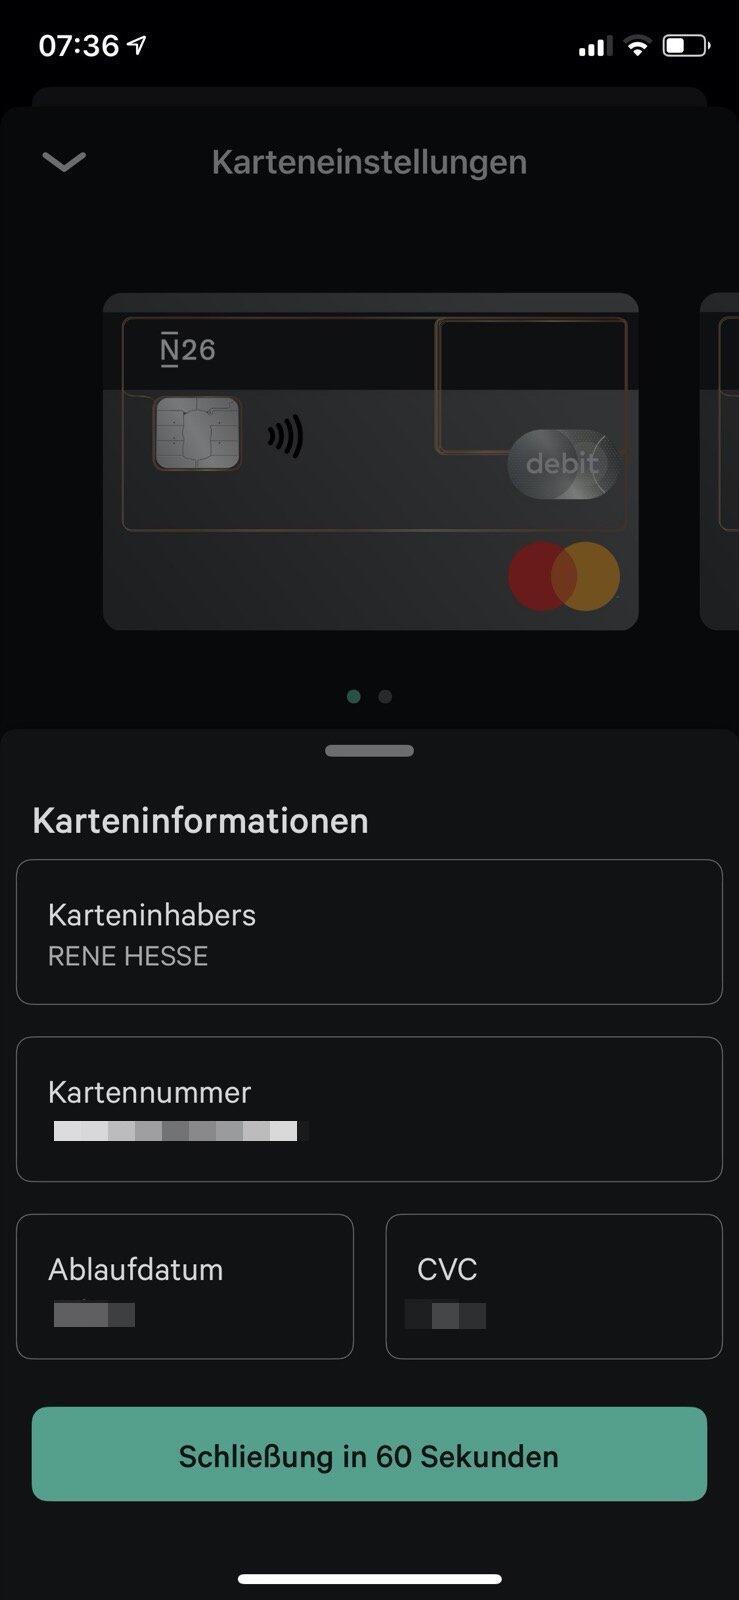 N26 Karten Details App